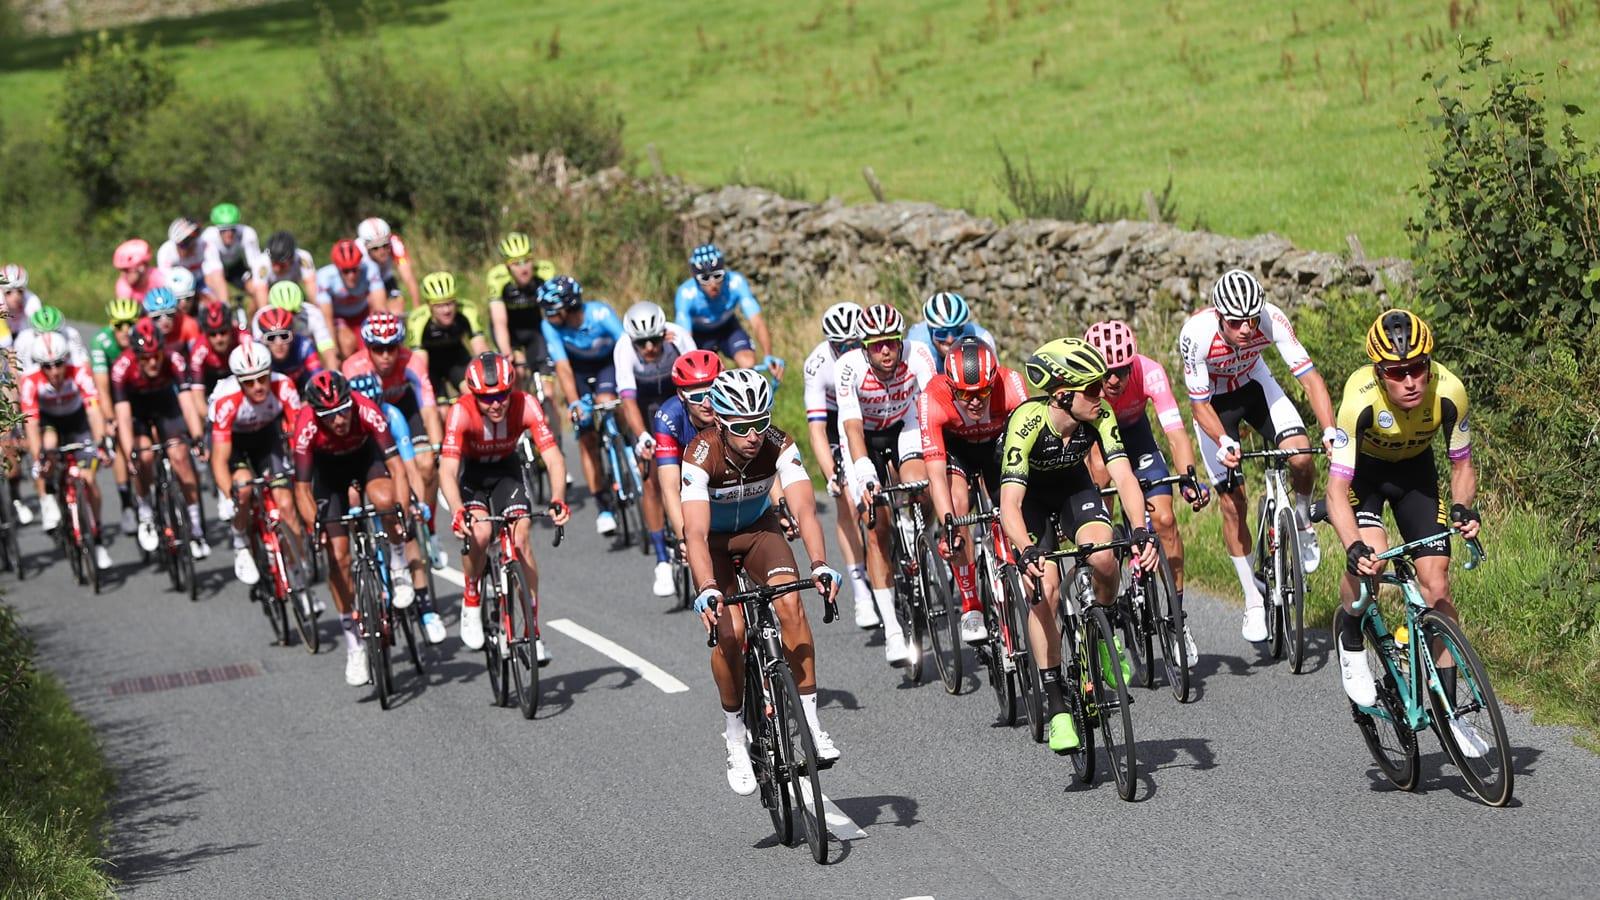 Tour of Britain COVID update